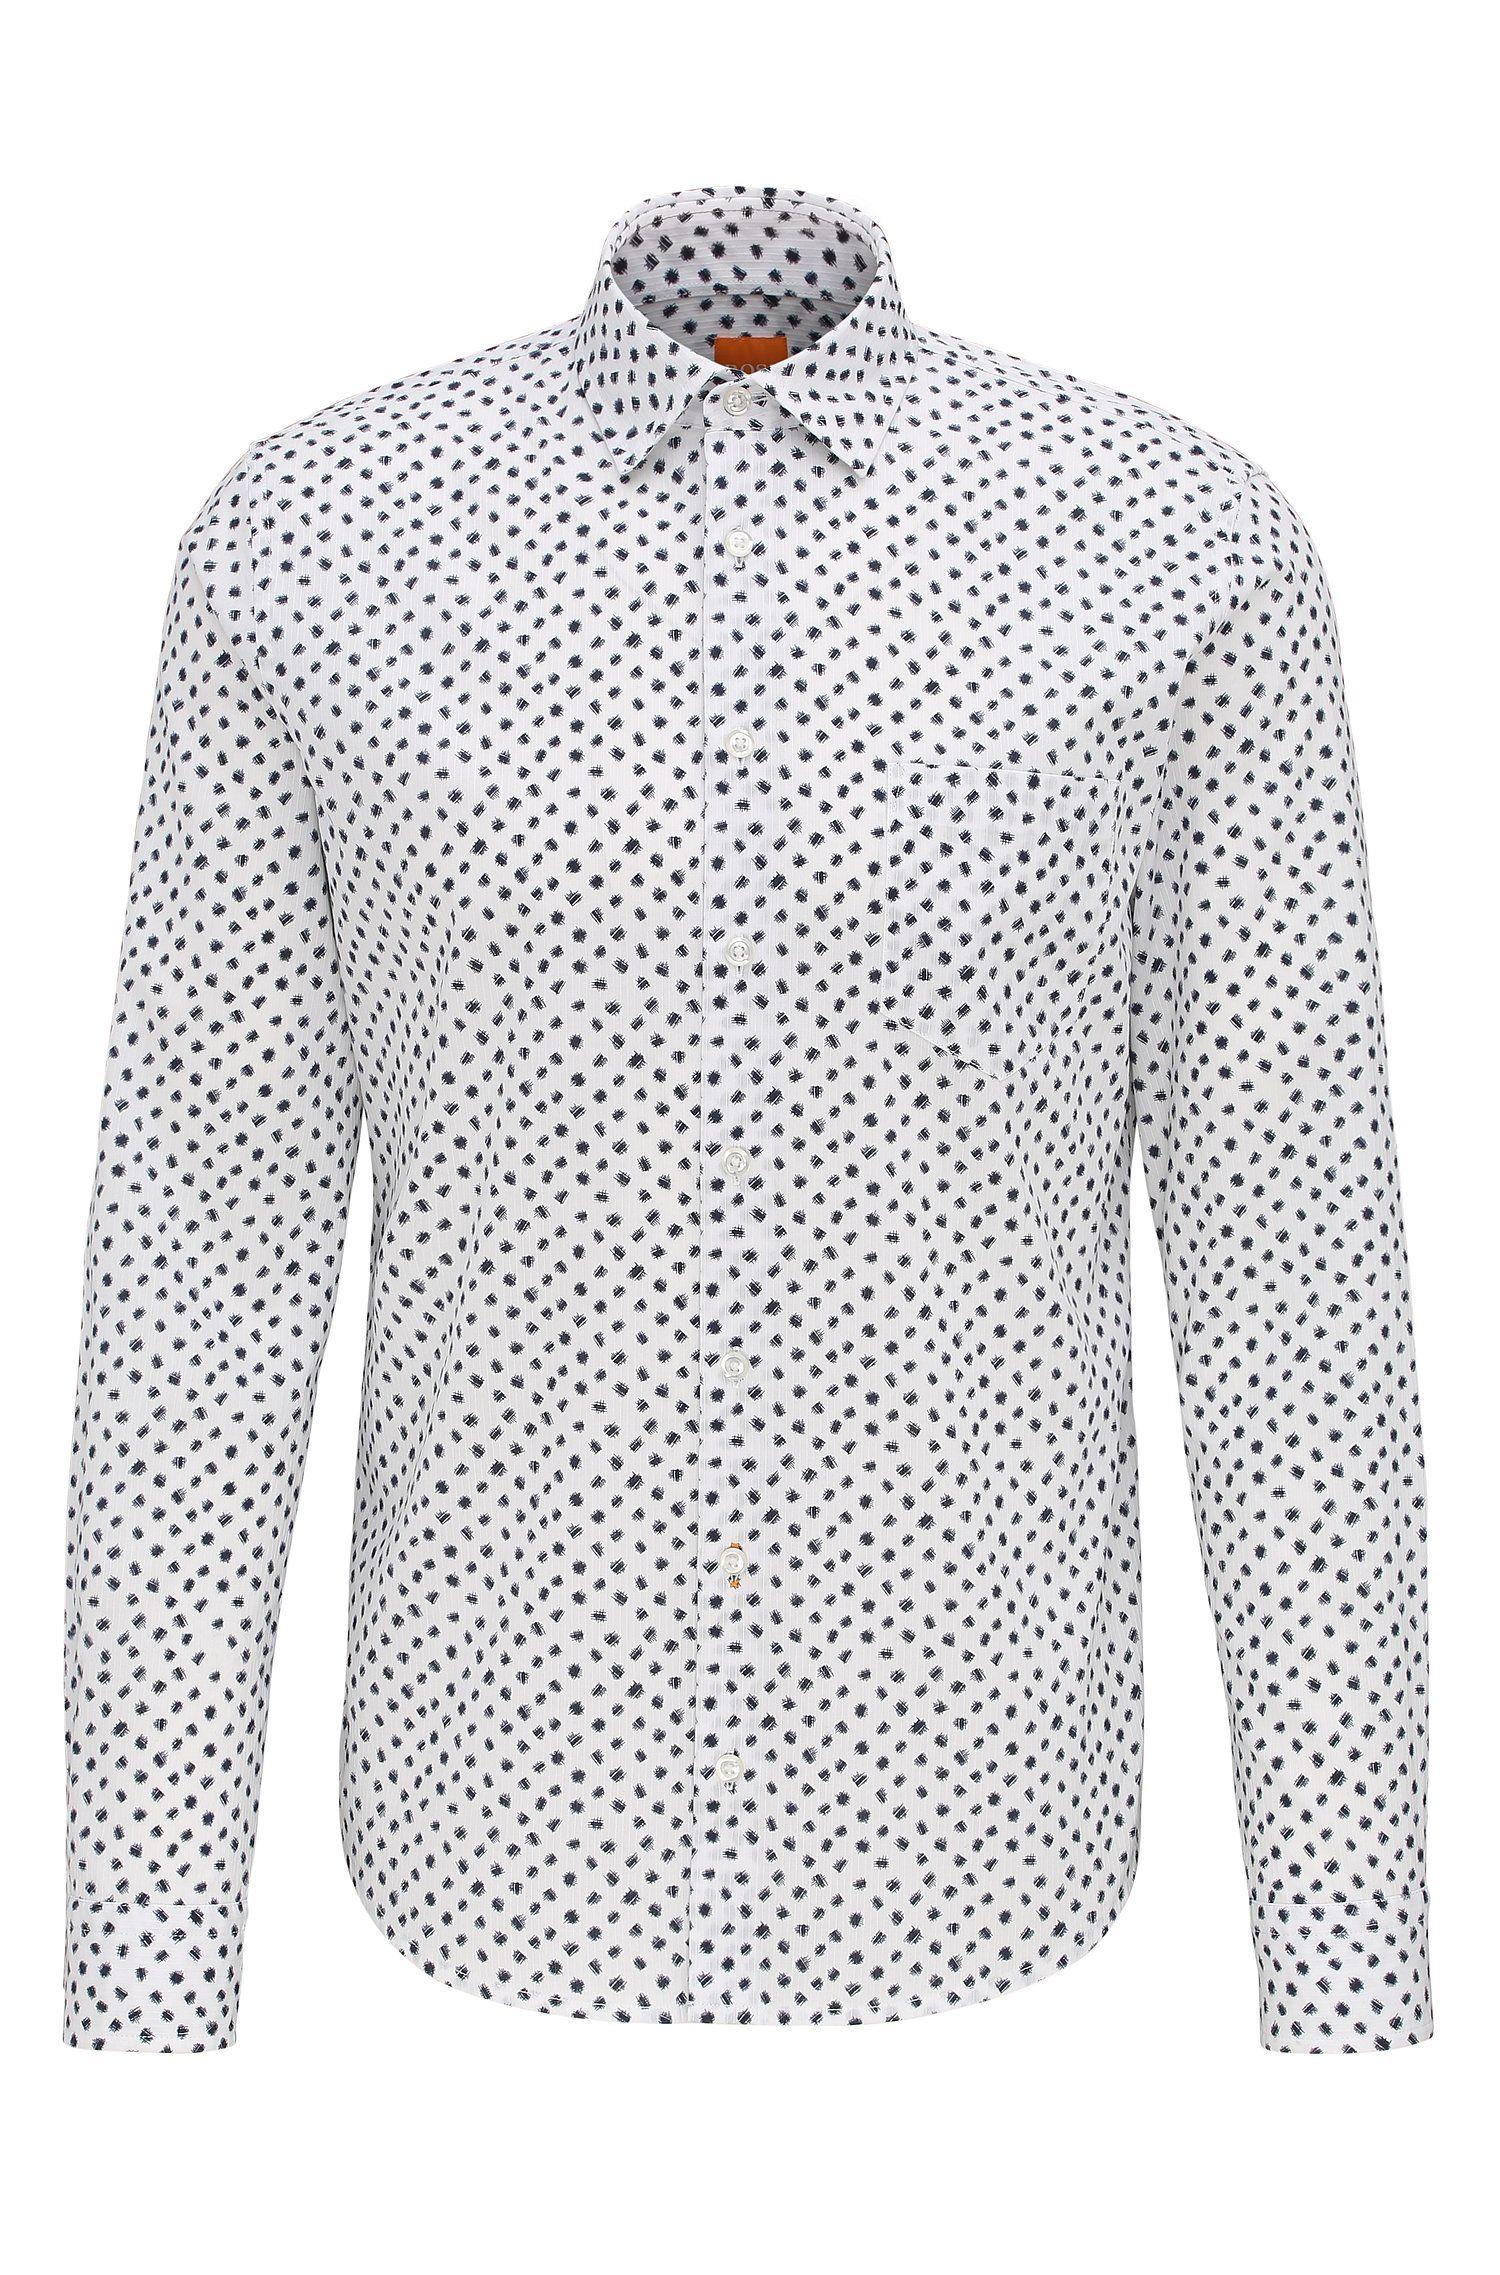 'Epop' | Slim Fit, Printed Cotton Button-Down Shirt